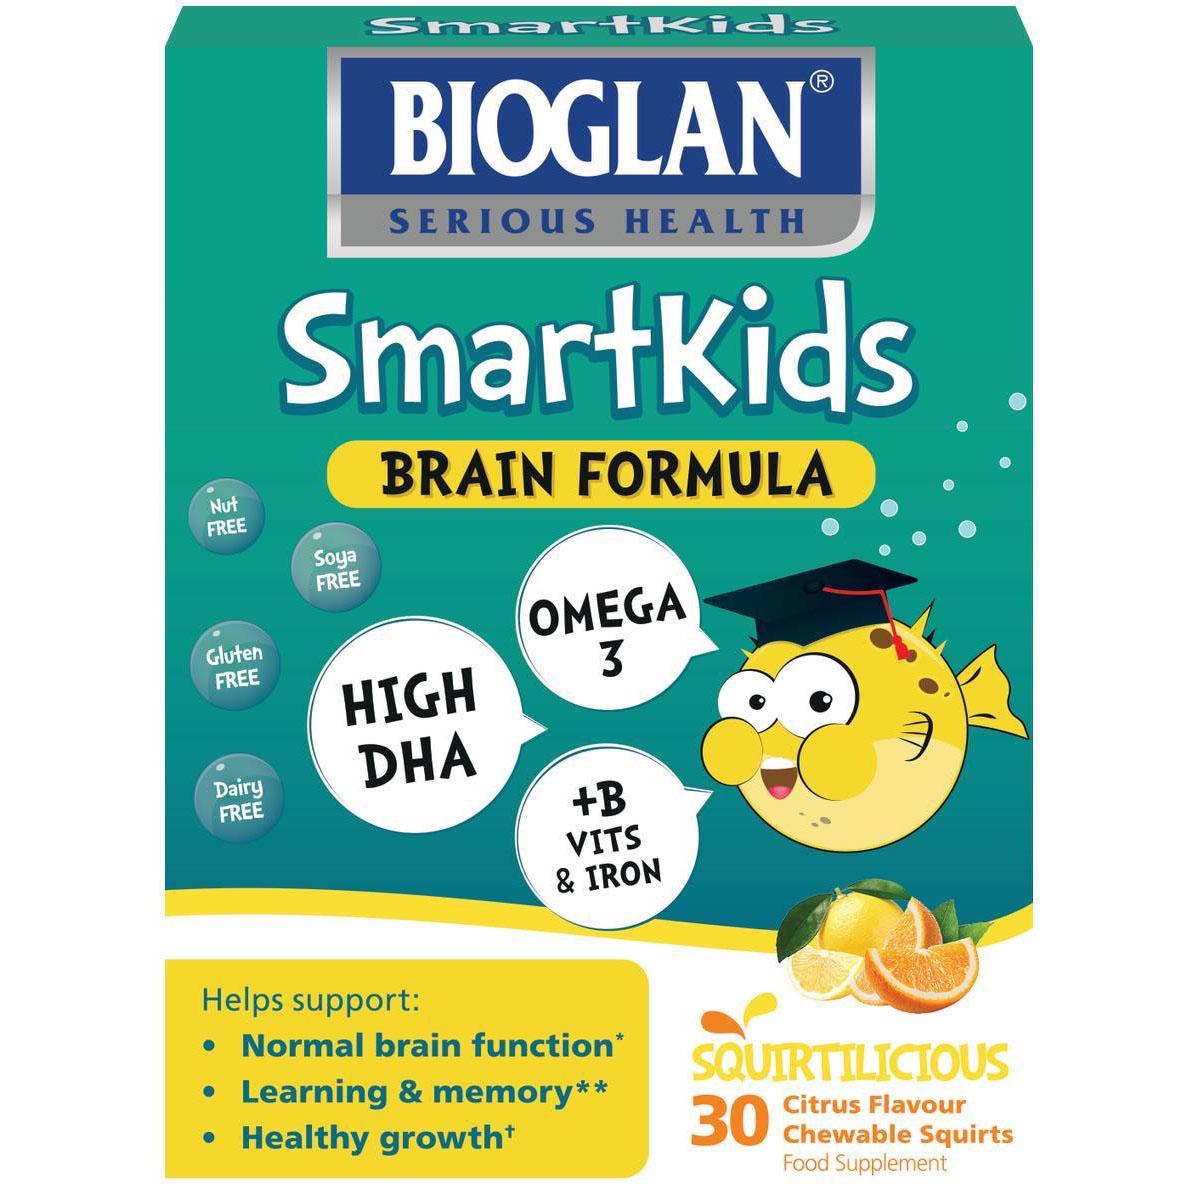 Bioglan Smartkids Brain Formula